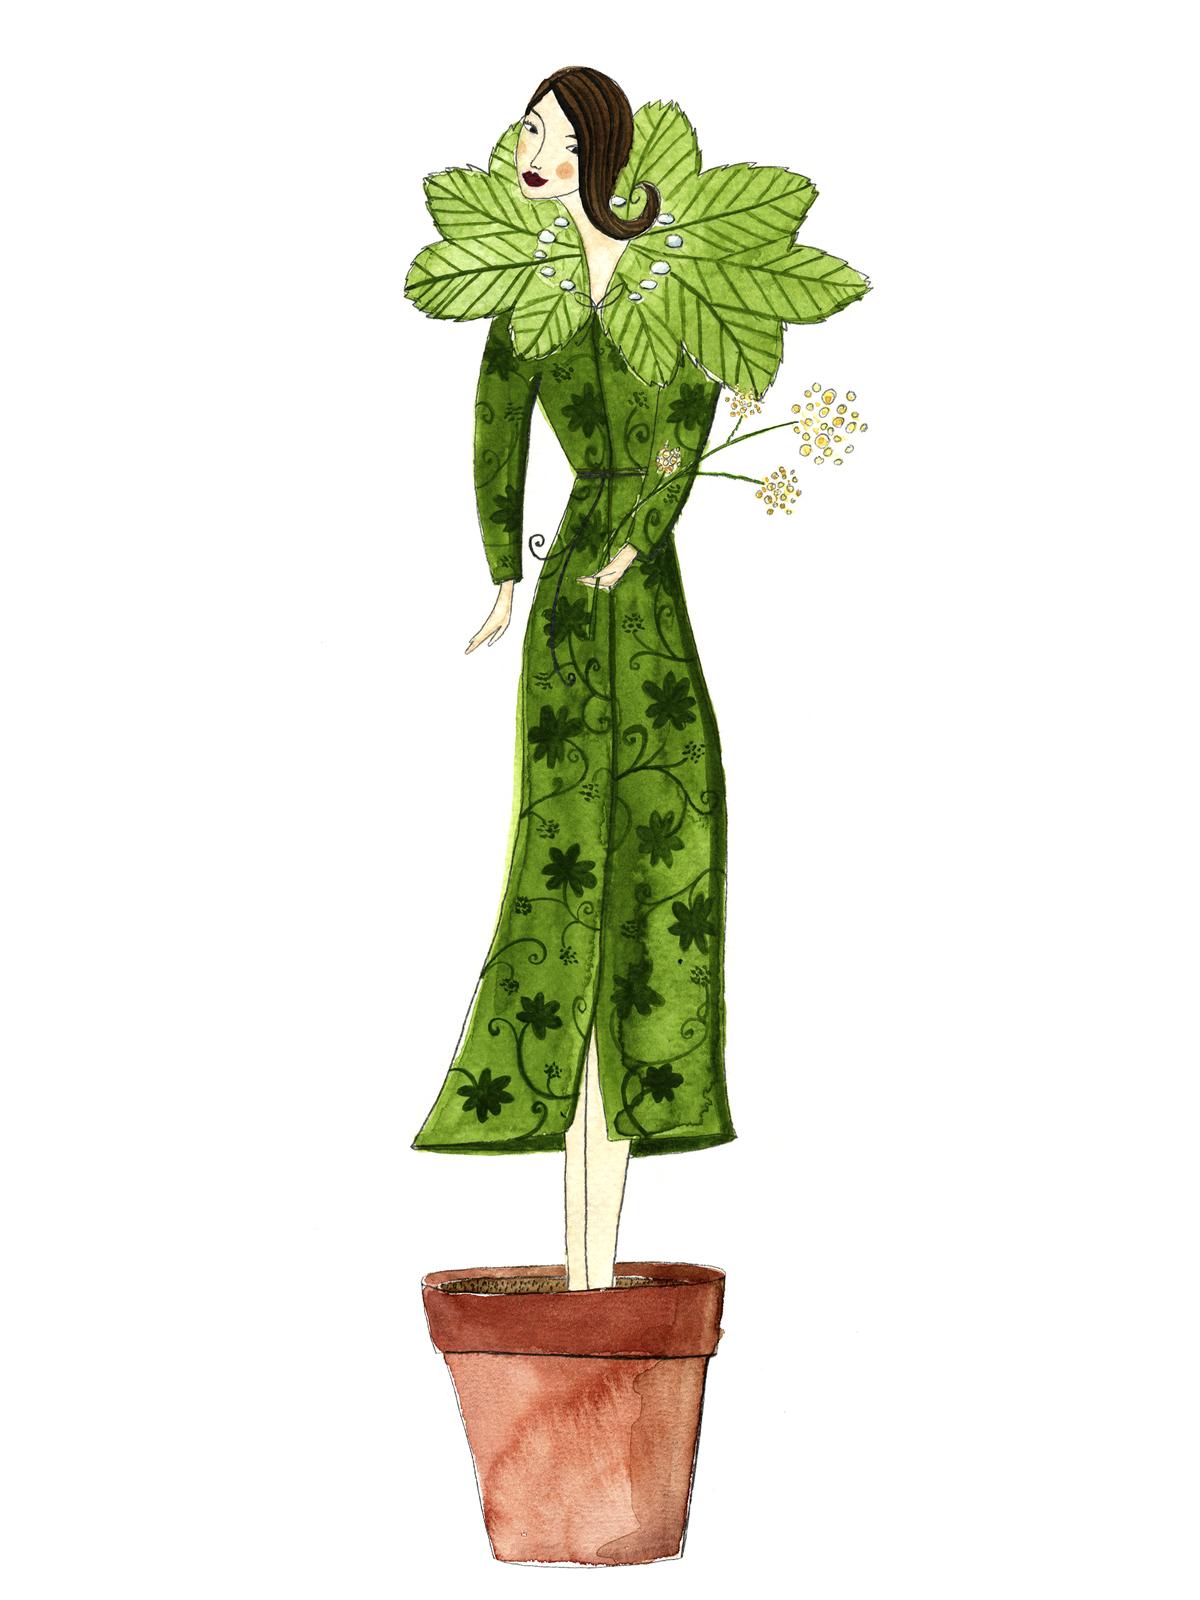 Pflanzenlexikon Gartenflora